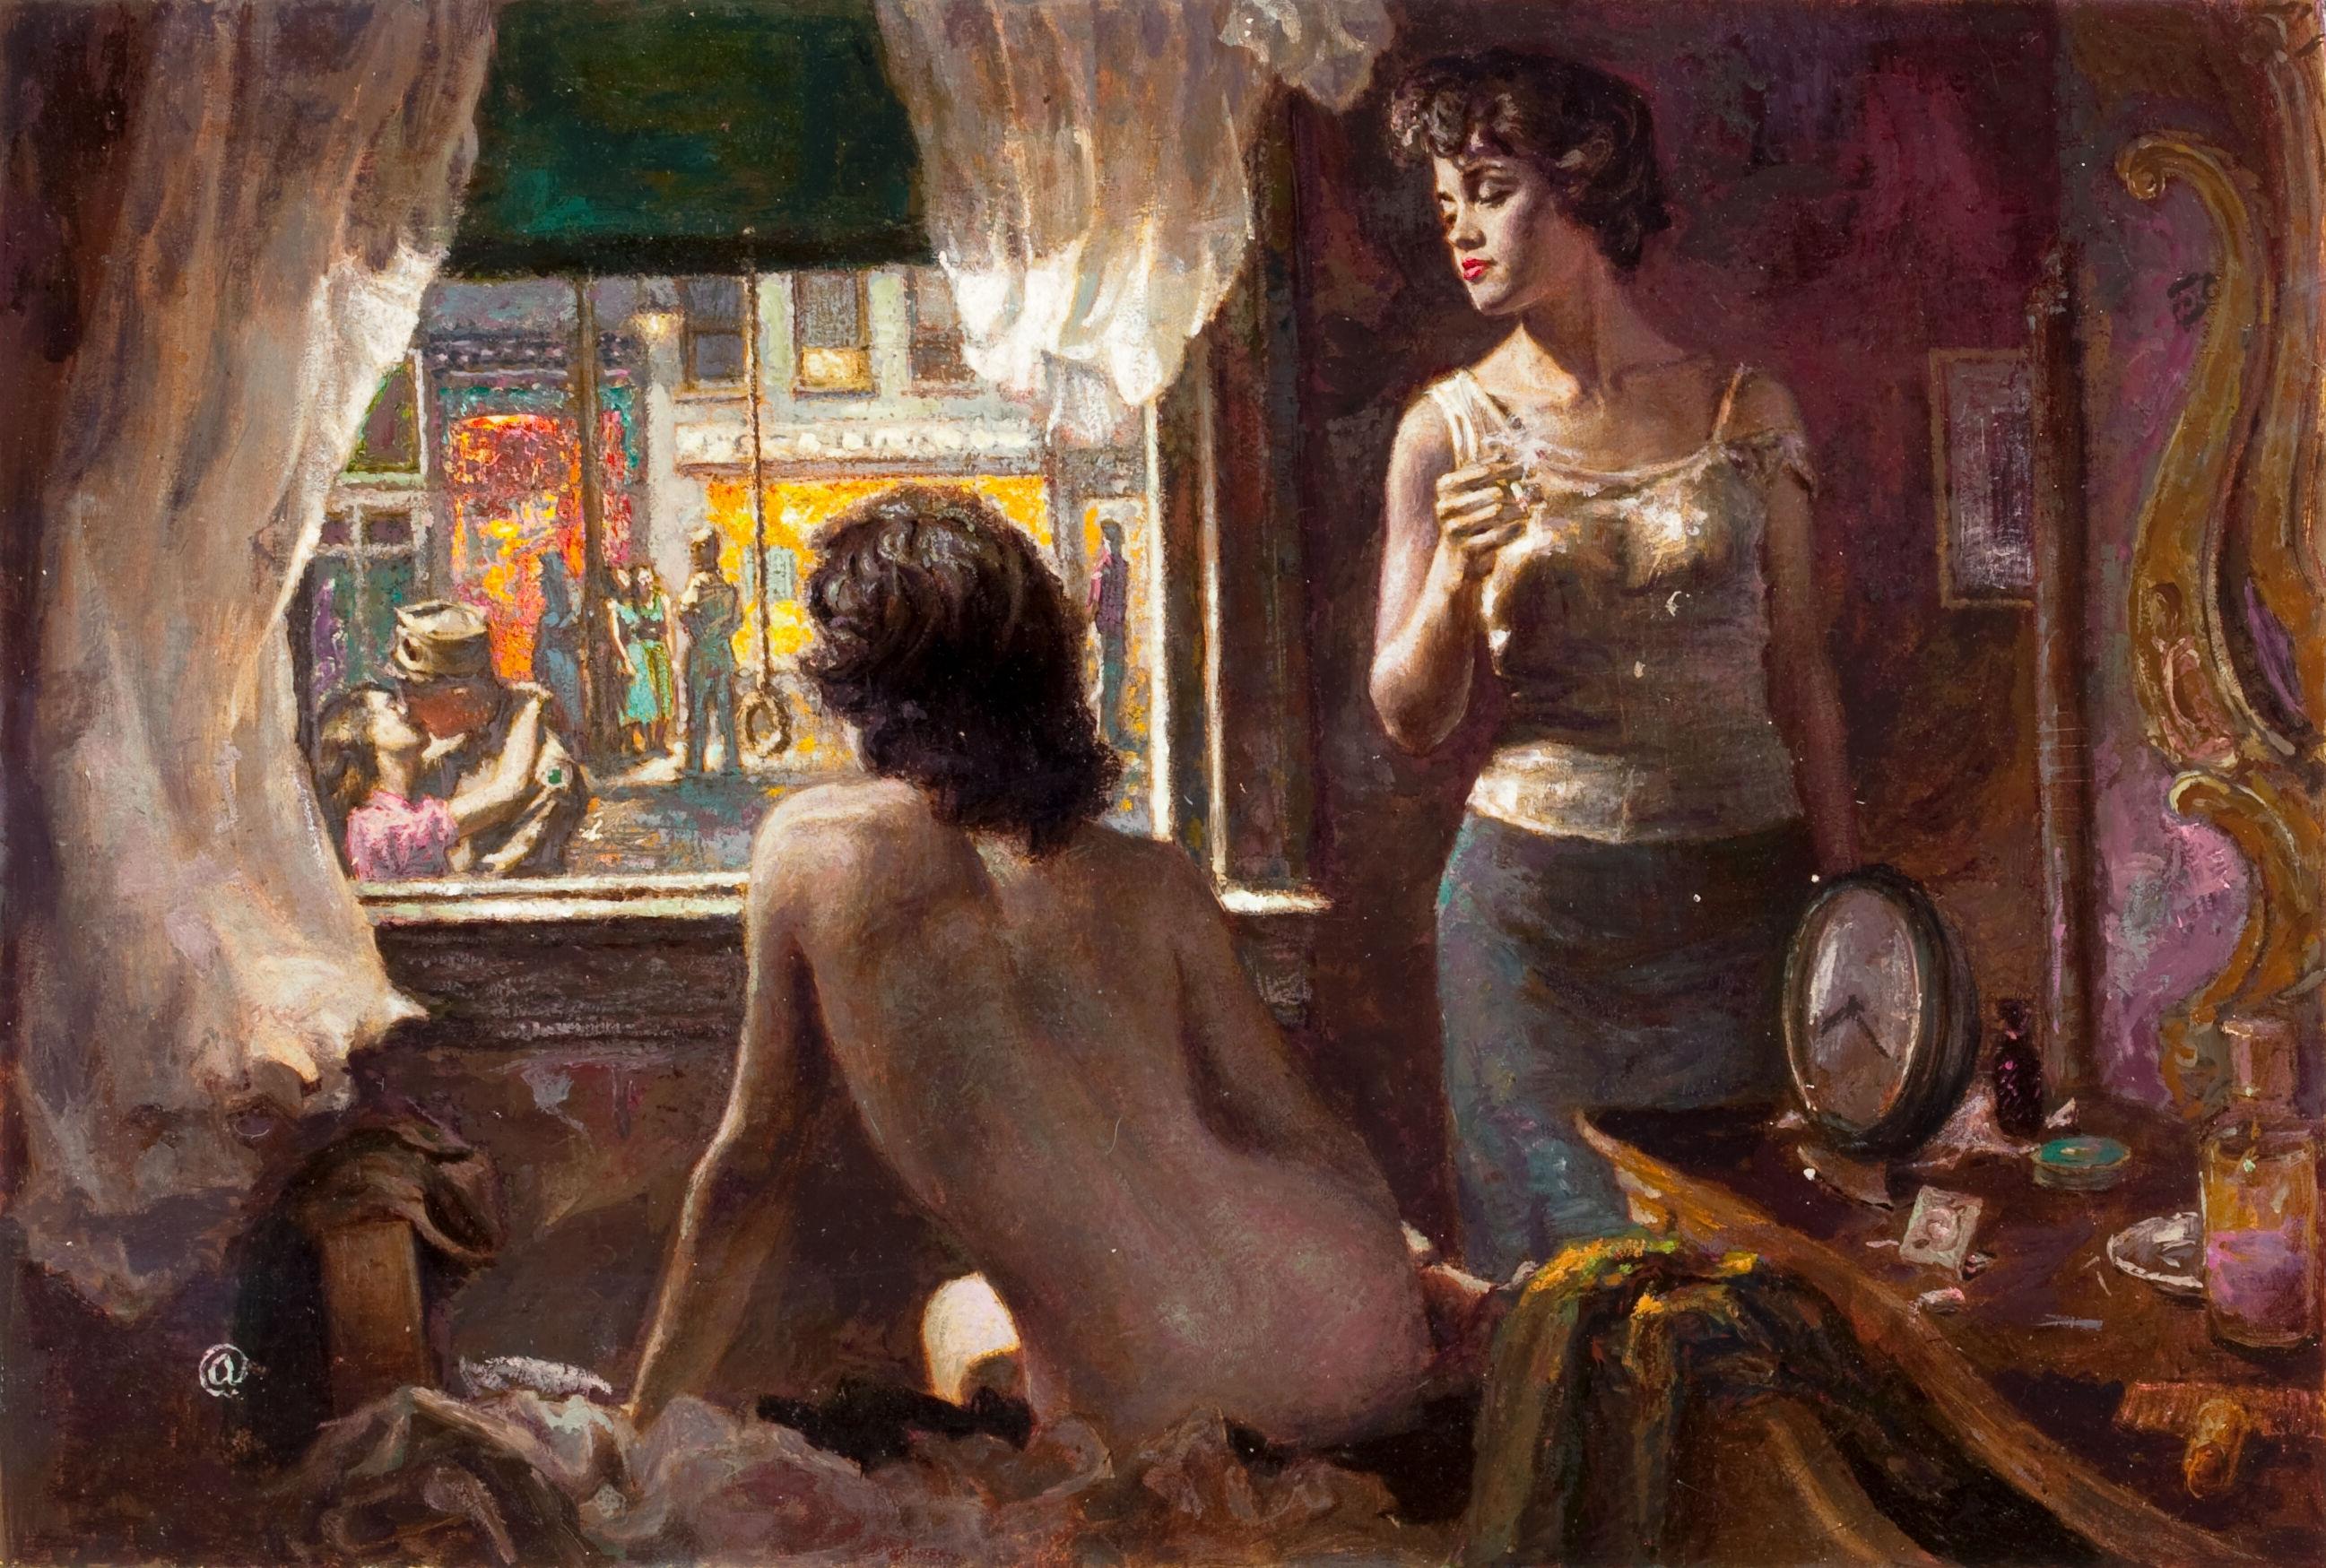 Erotic lonely woman art photos 560